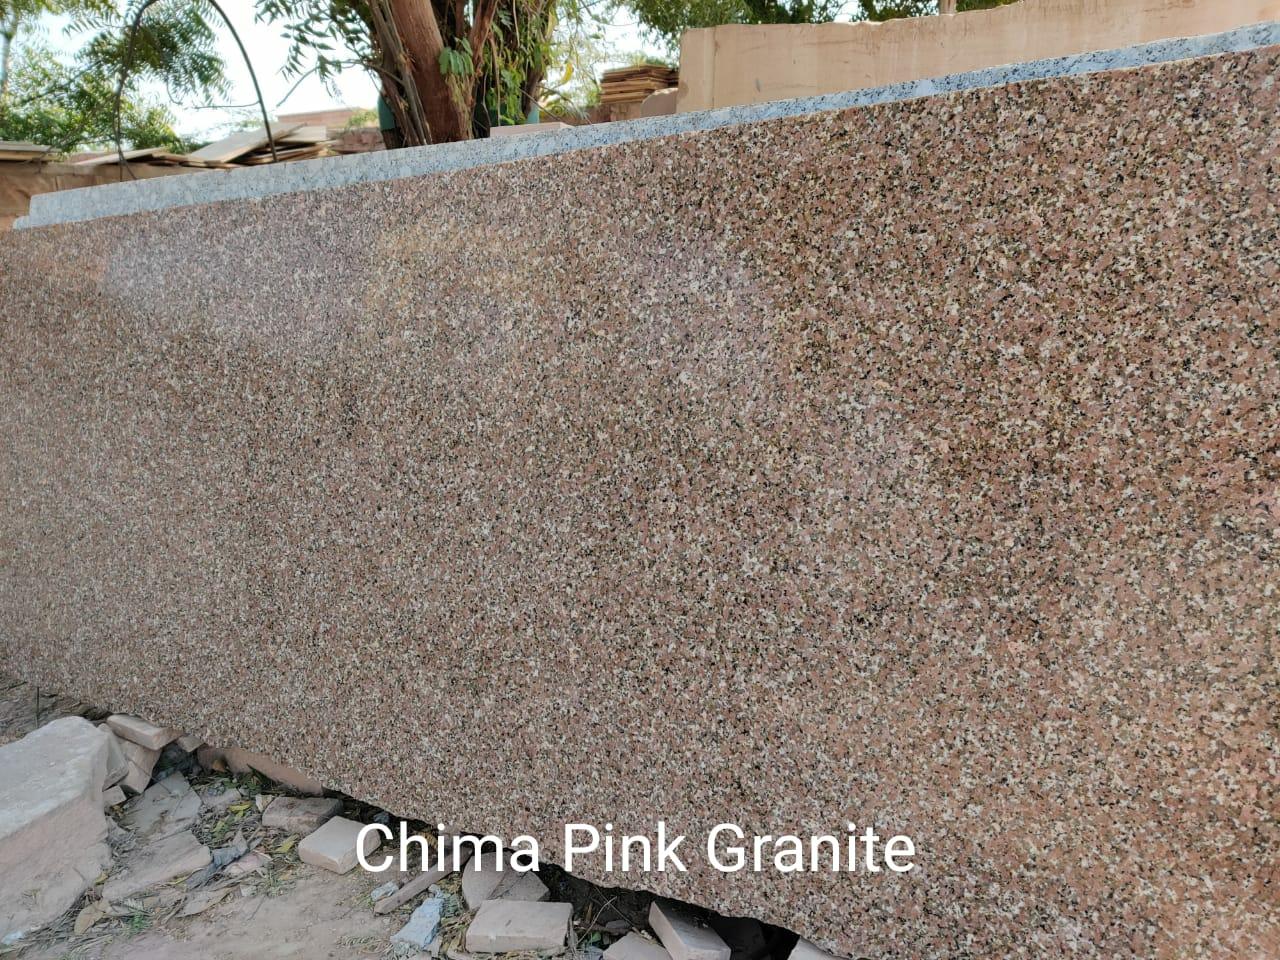 Chima Pink